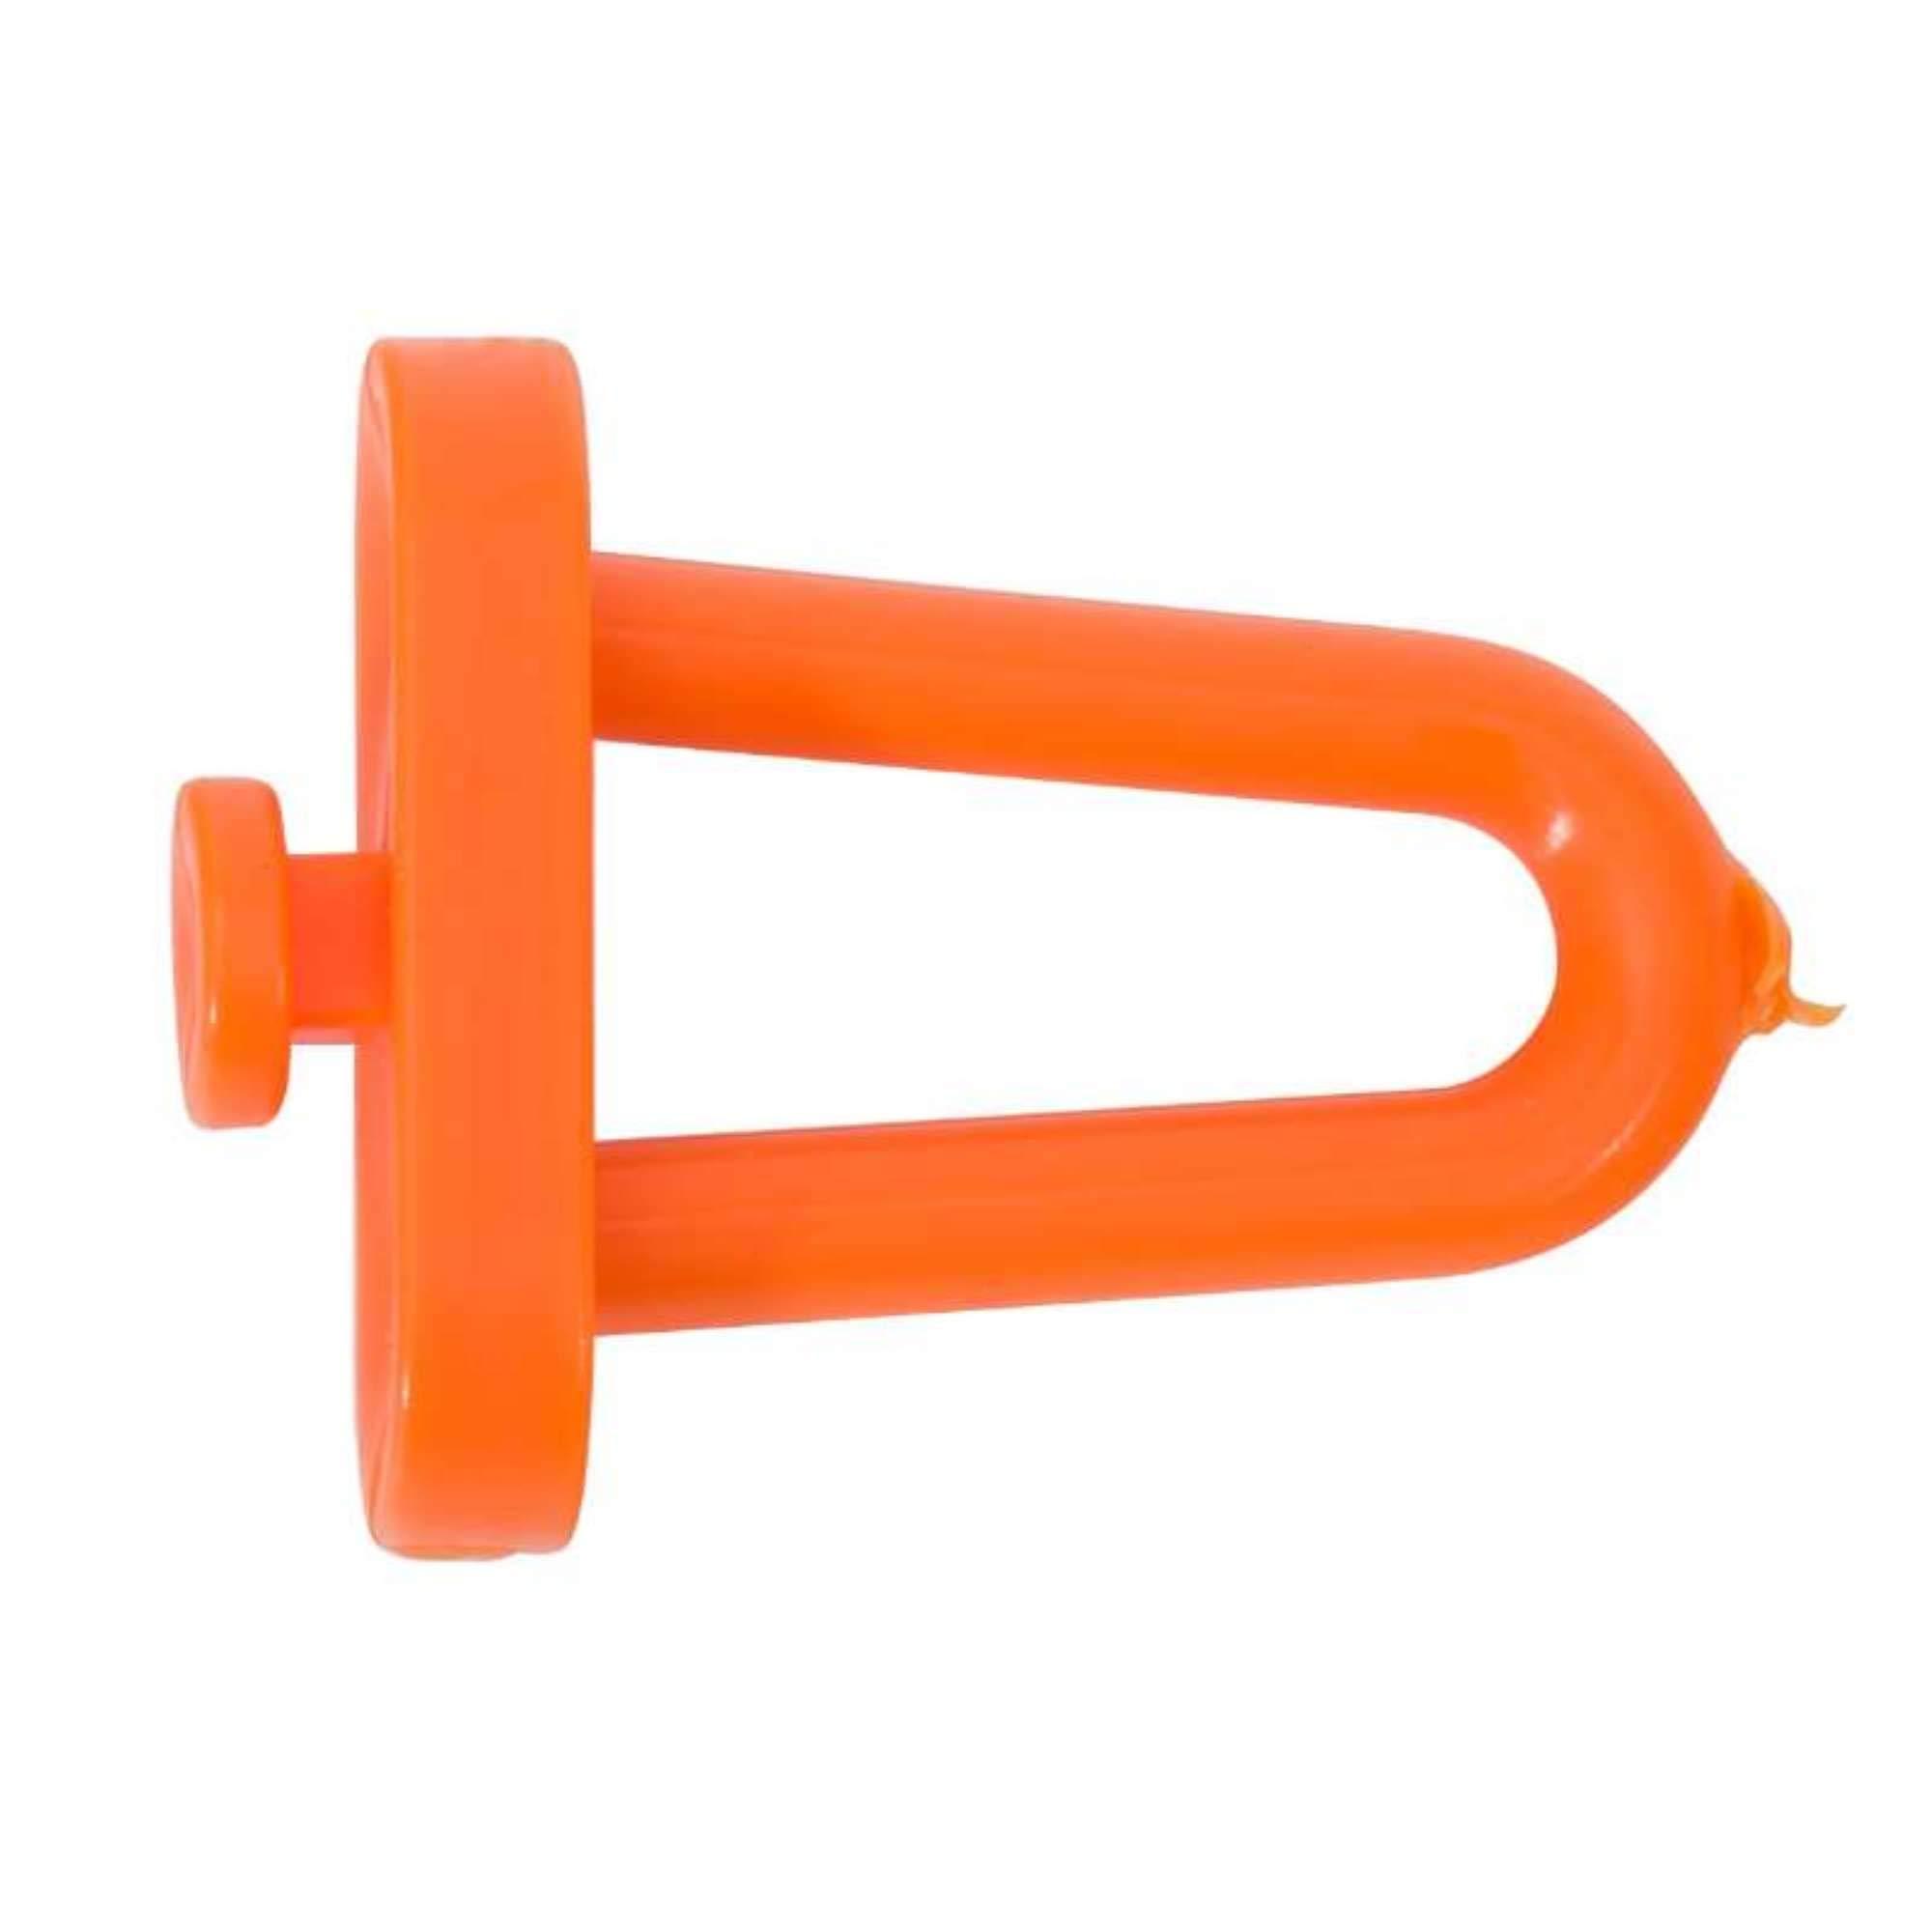 Colore Arancione Werkapro 10867 Set di 24 Ganci aggiuntivi per Pannelli da Parete